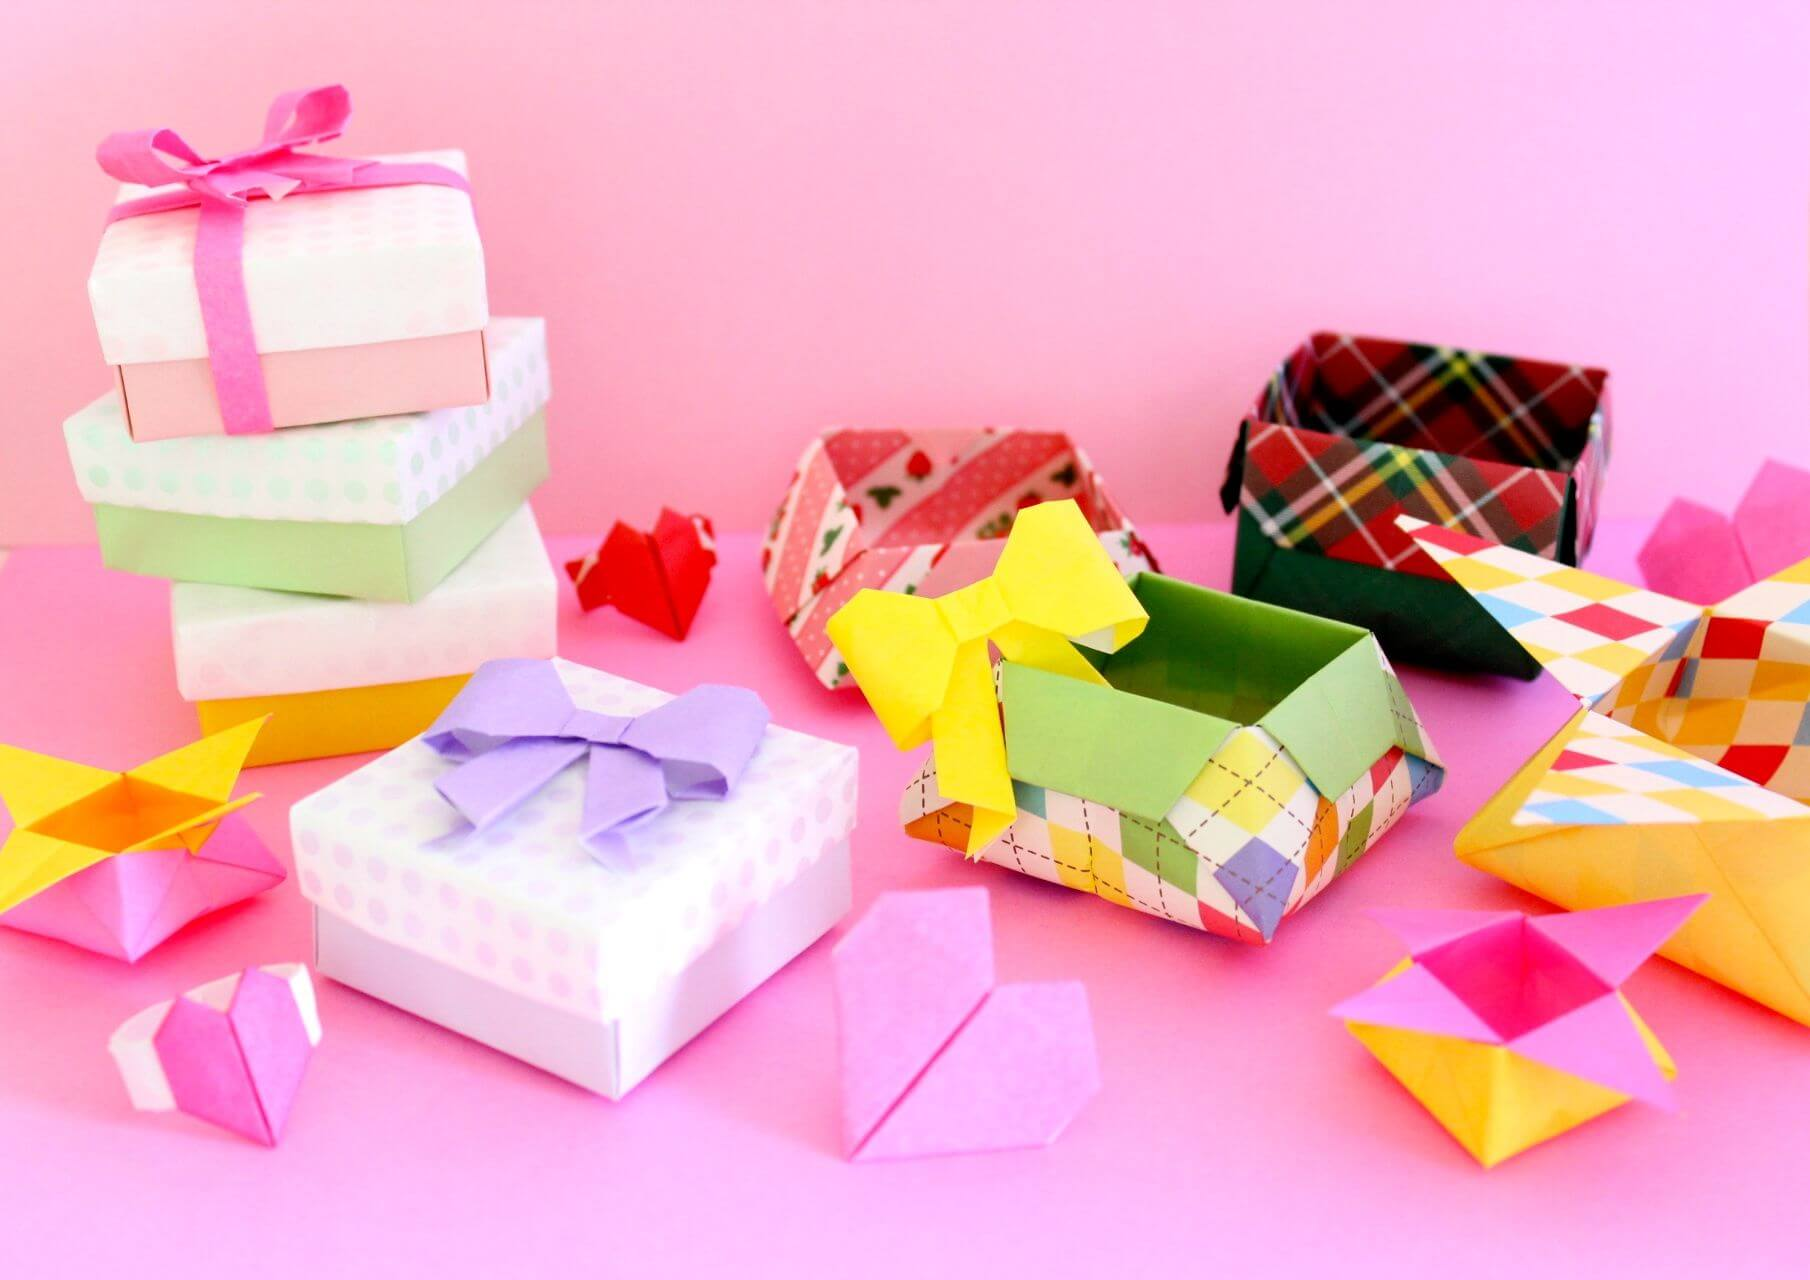 Ways to Use Origami